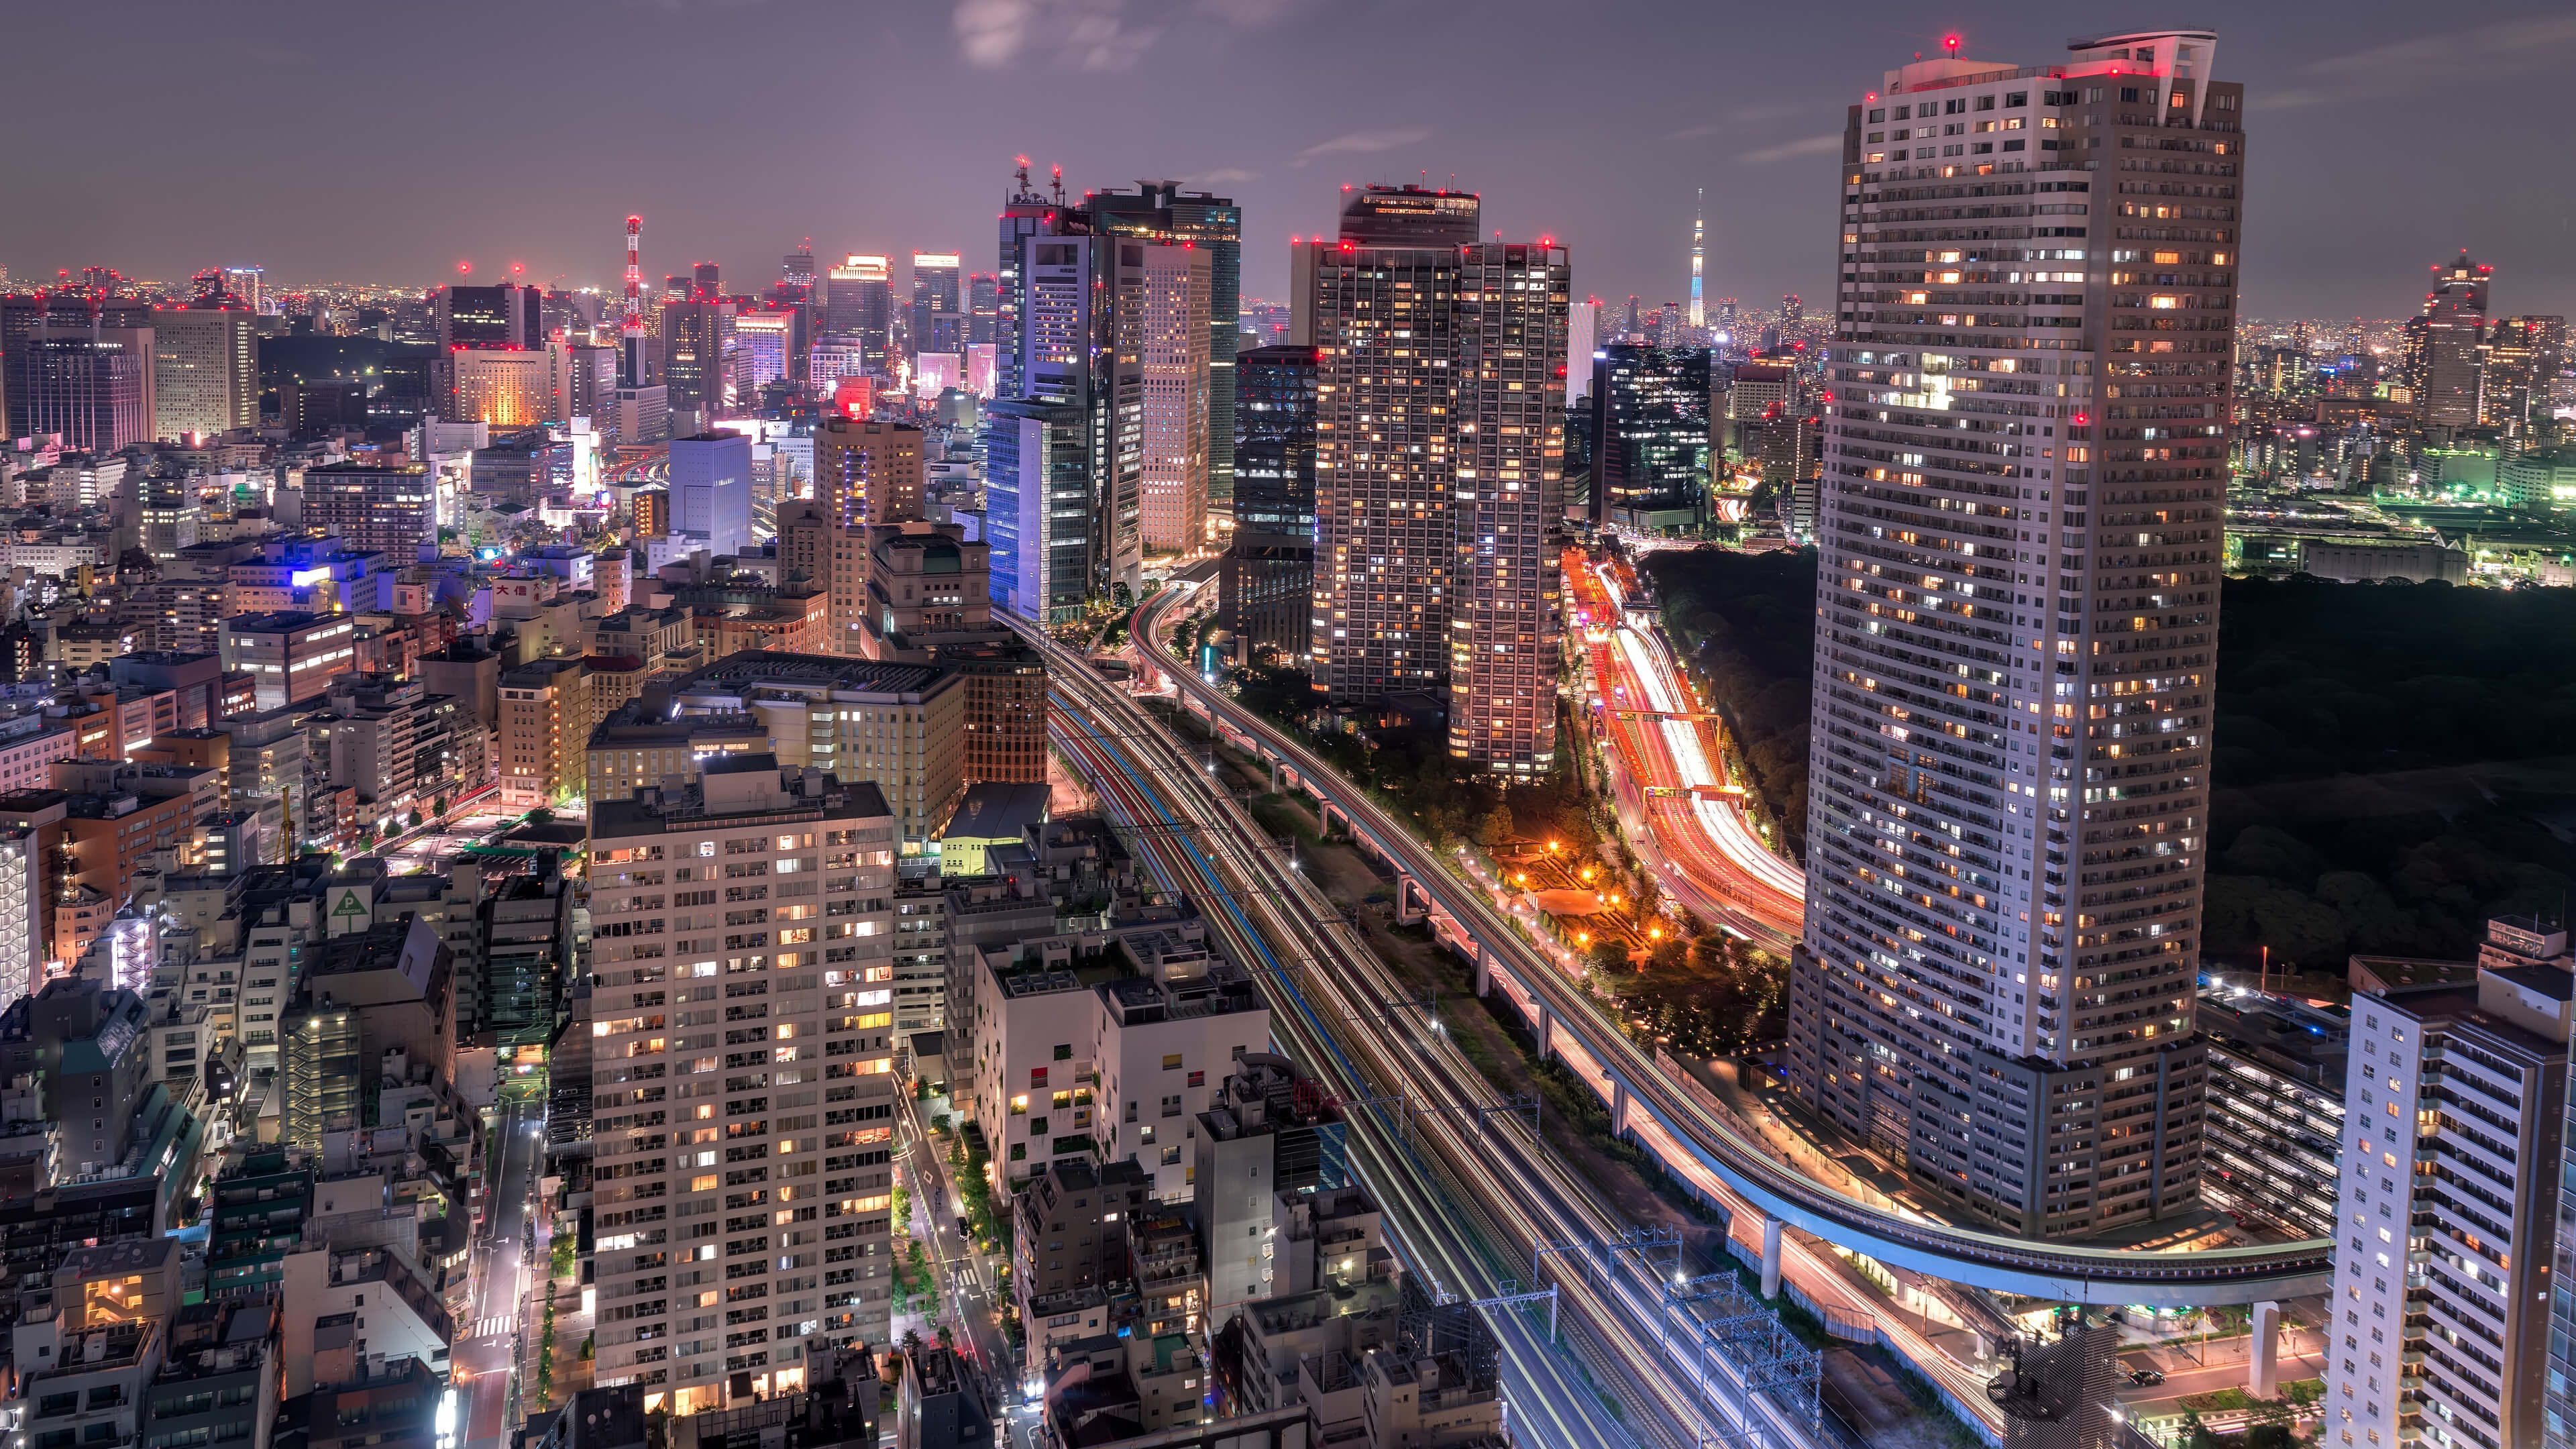 Shiodome Skyline At Night Minato Tokyo Japan HD Trap Music Mix City Wallpaper